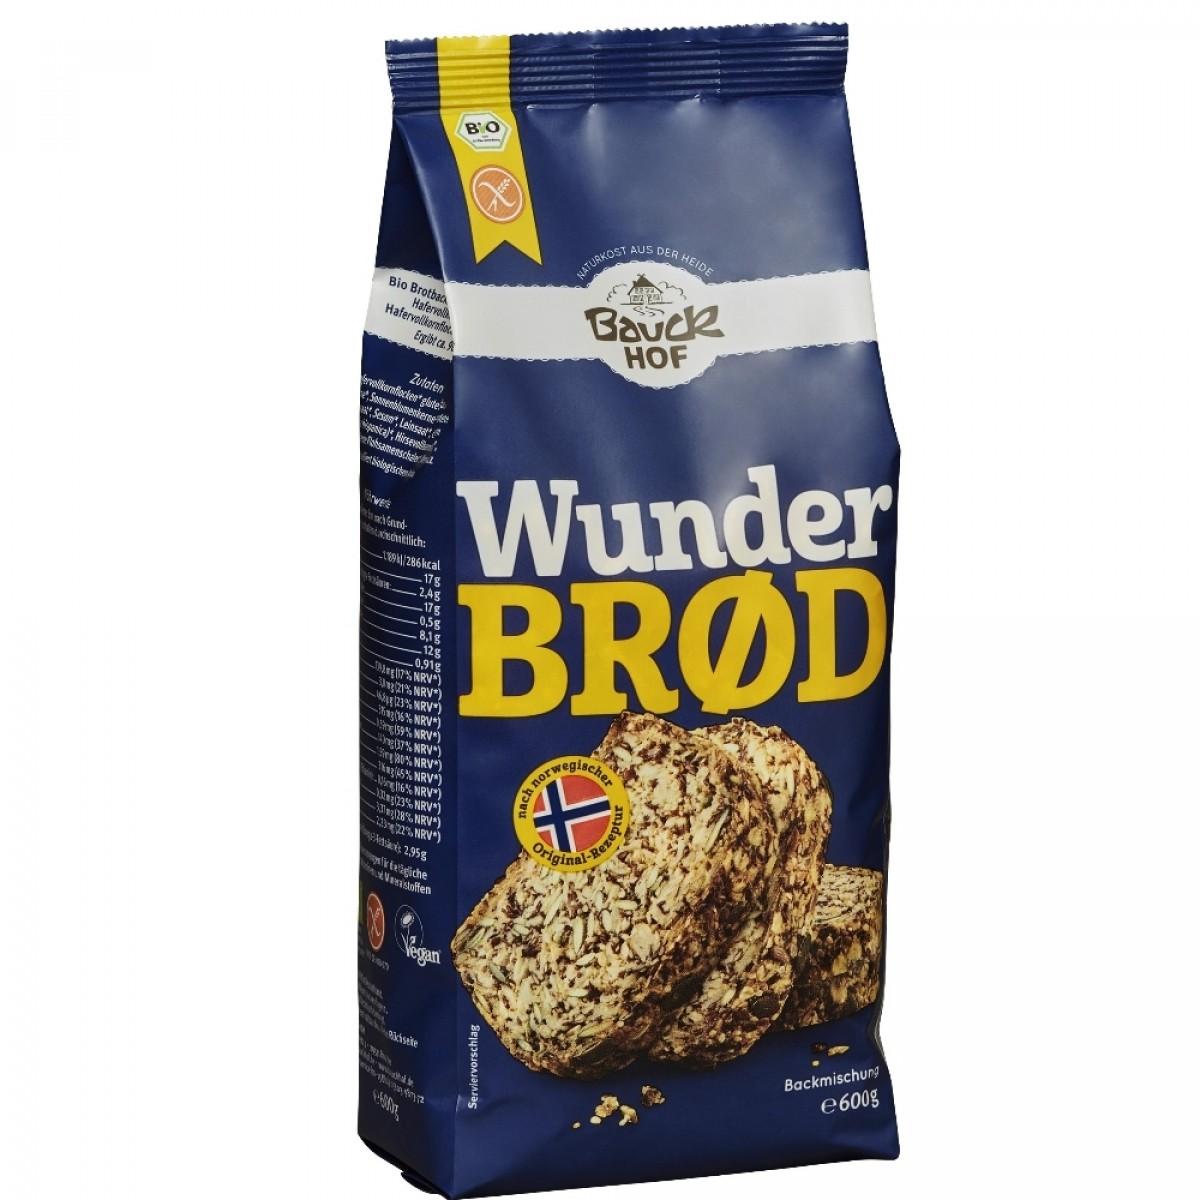 Broodmix Havervolkoren (Wunderbrood)